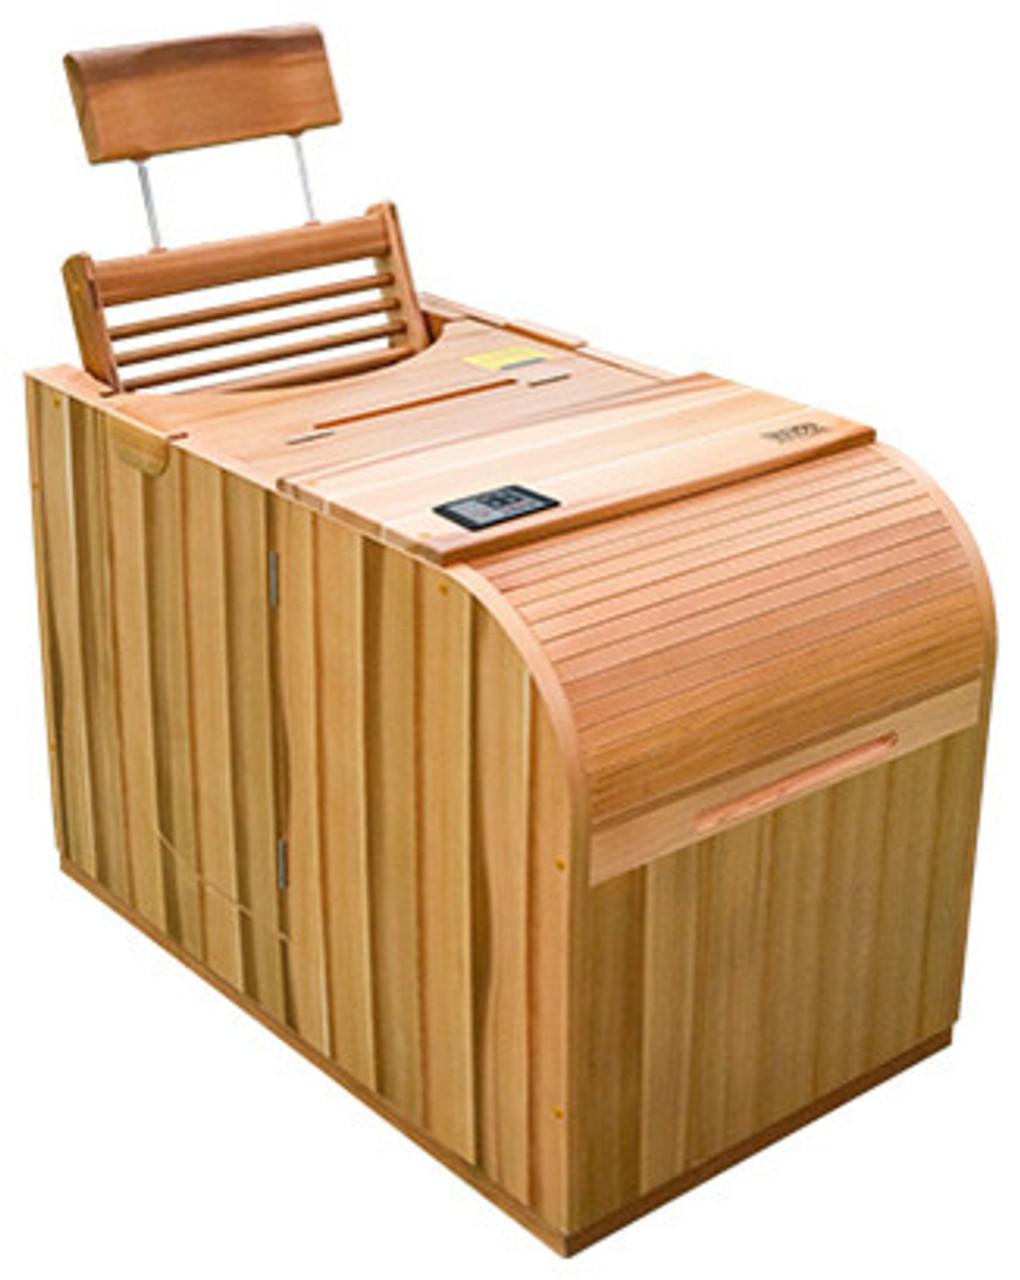 Fabulous Health Mate Sauna Essential Lounge Ozone Recreation Machost Co Dining Chair Design Ideas Machostcouk